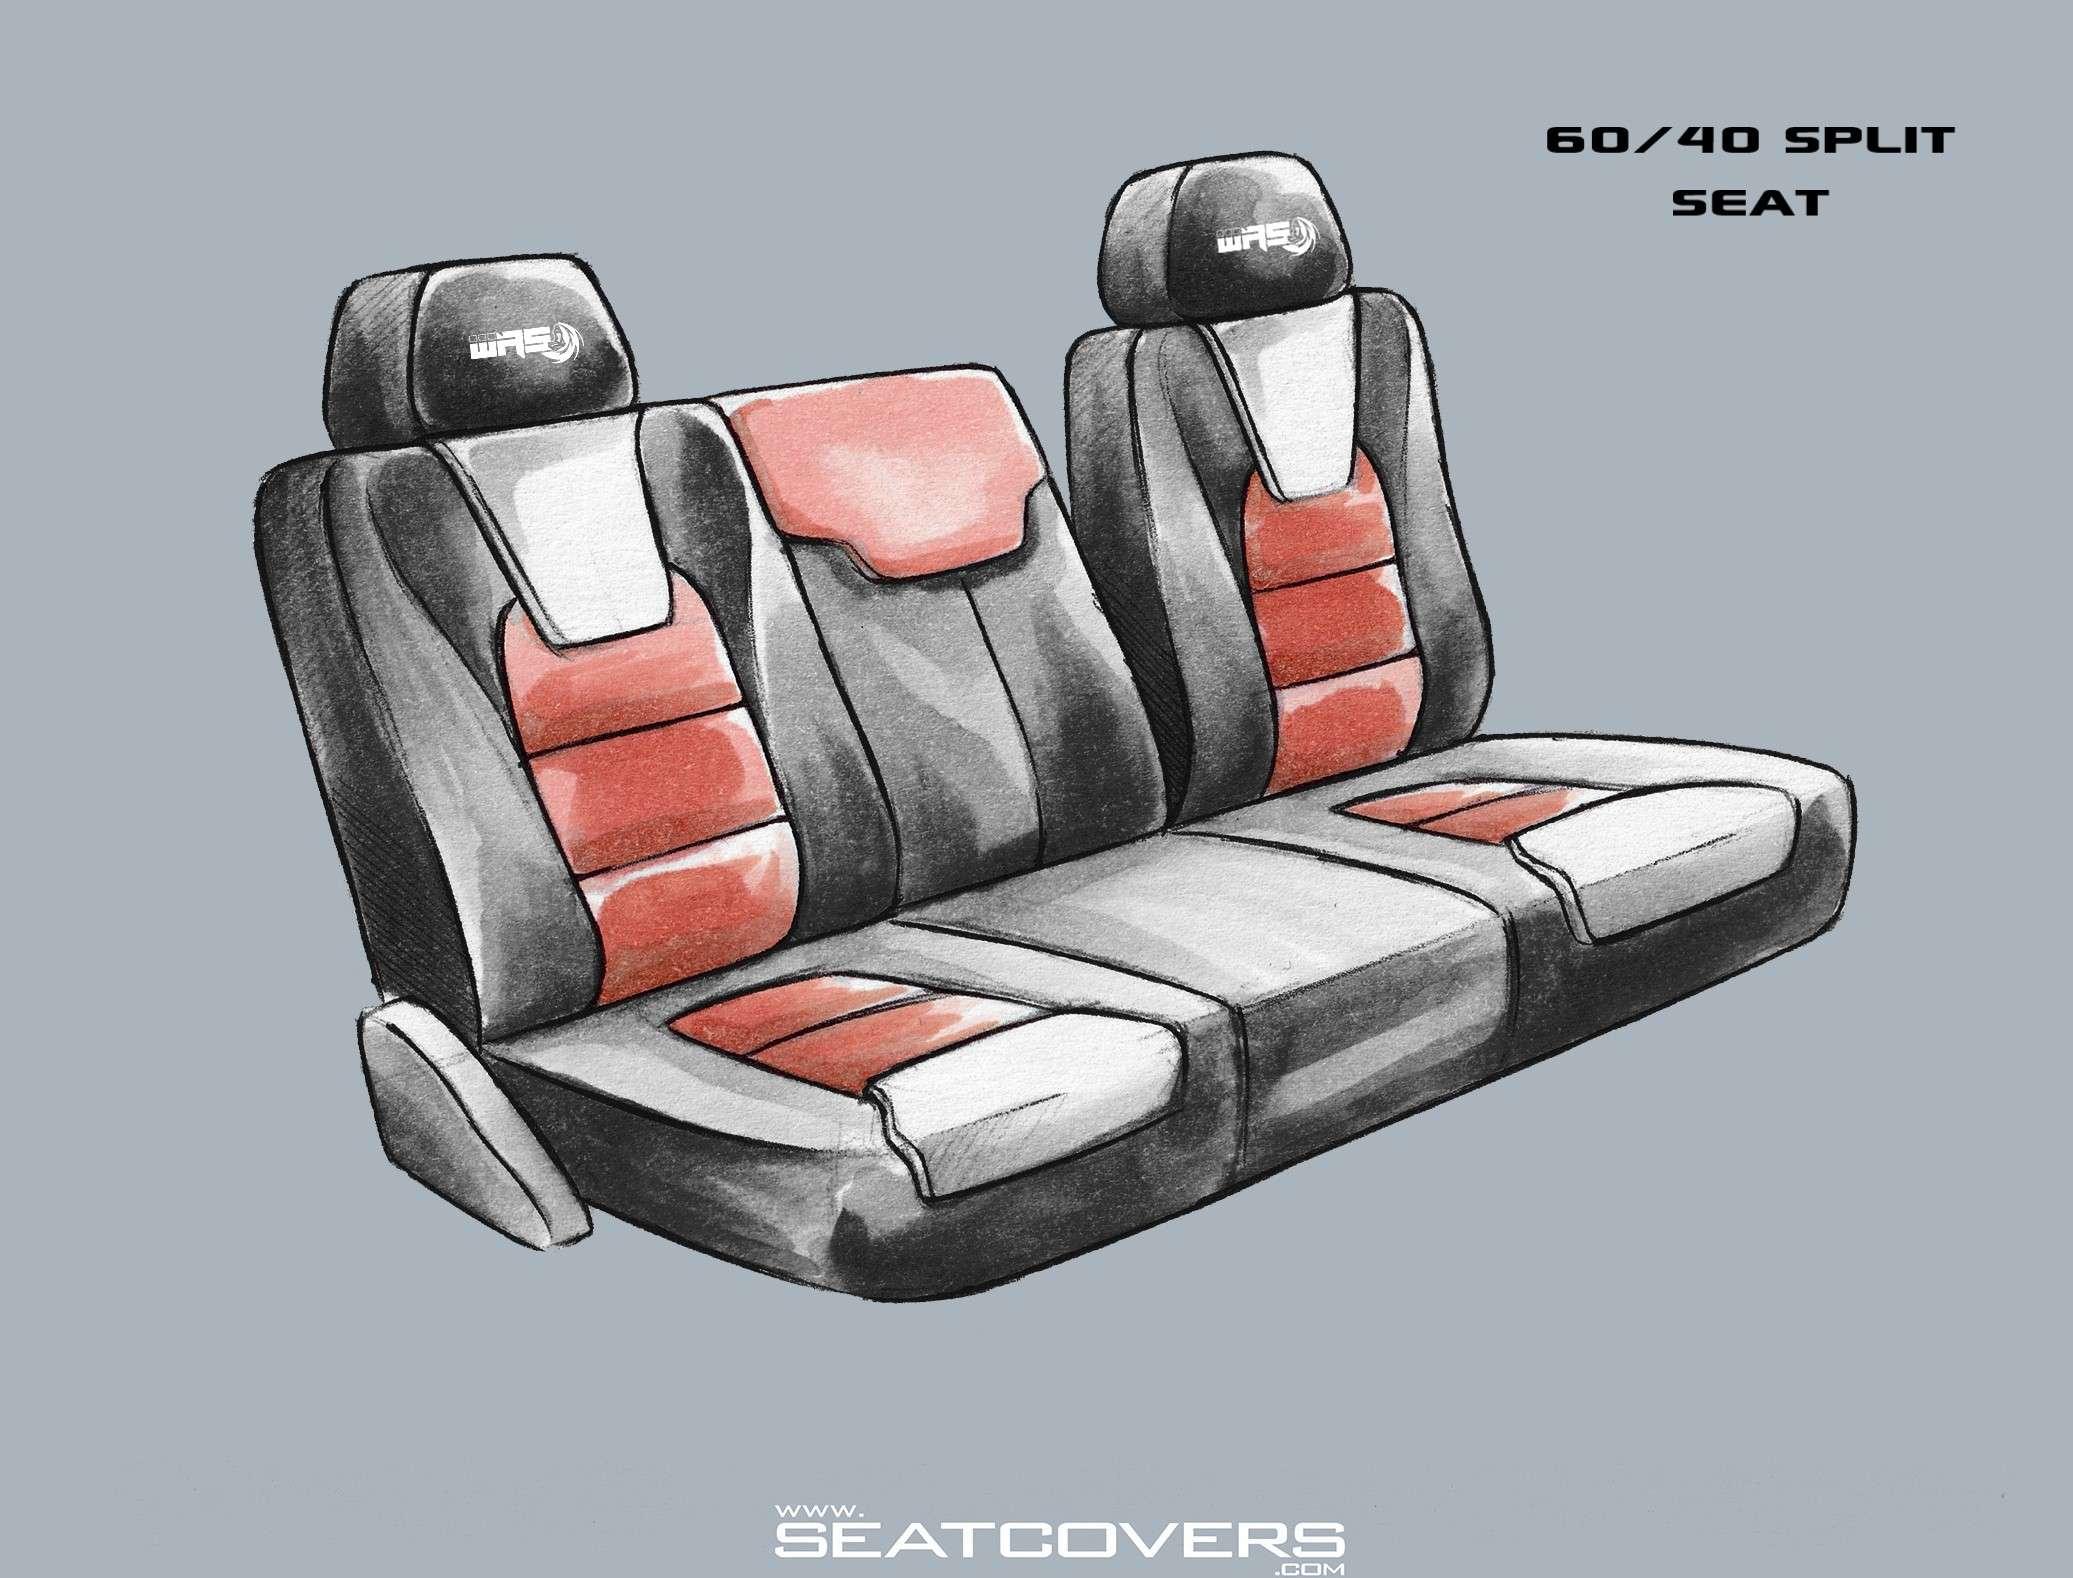 Toyota Tacoma rear seat covers Tacoma seat covers www.seatcovers.com